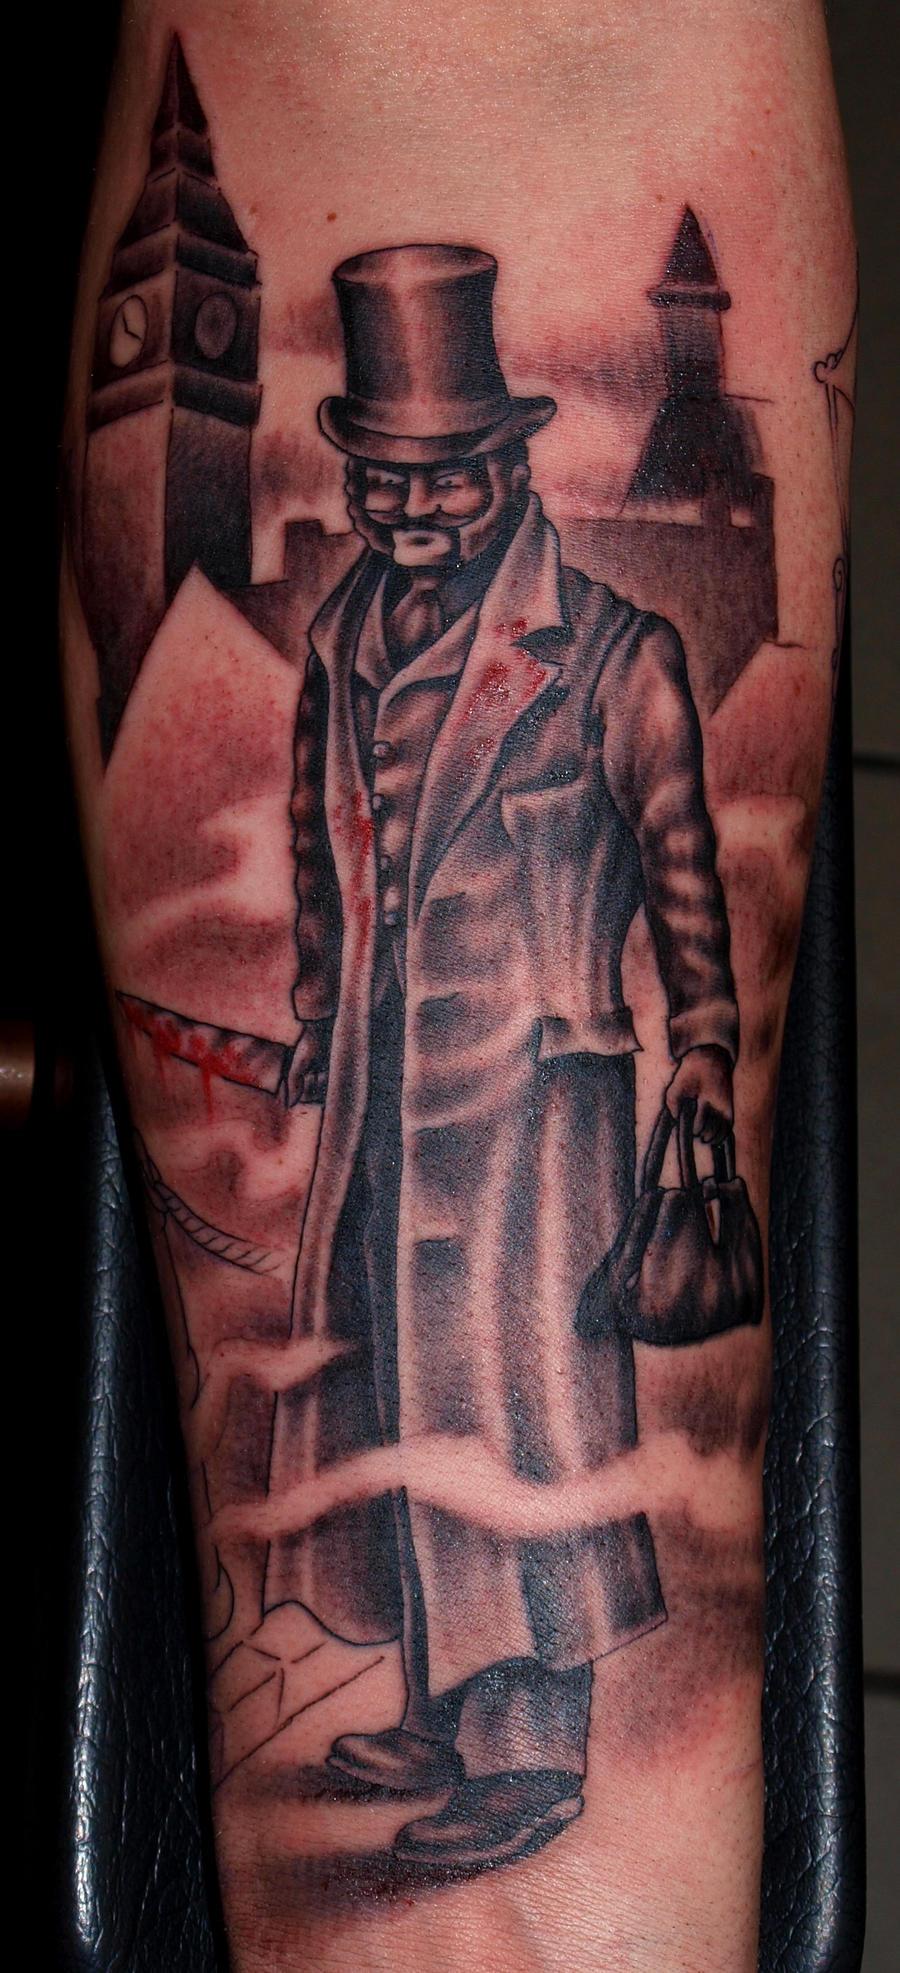 Jack the ripper tattoo gallery